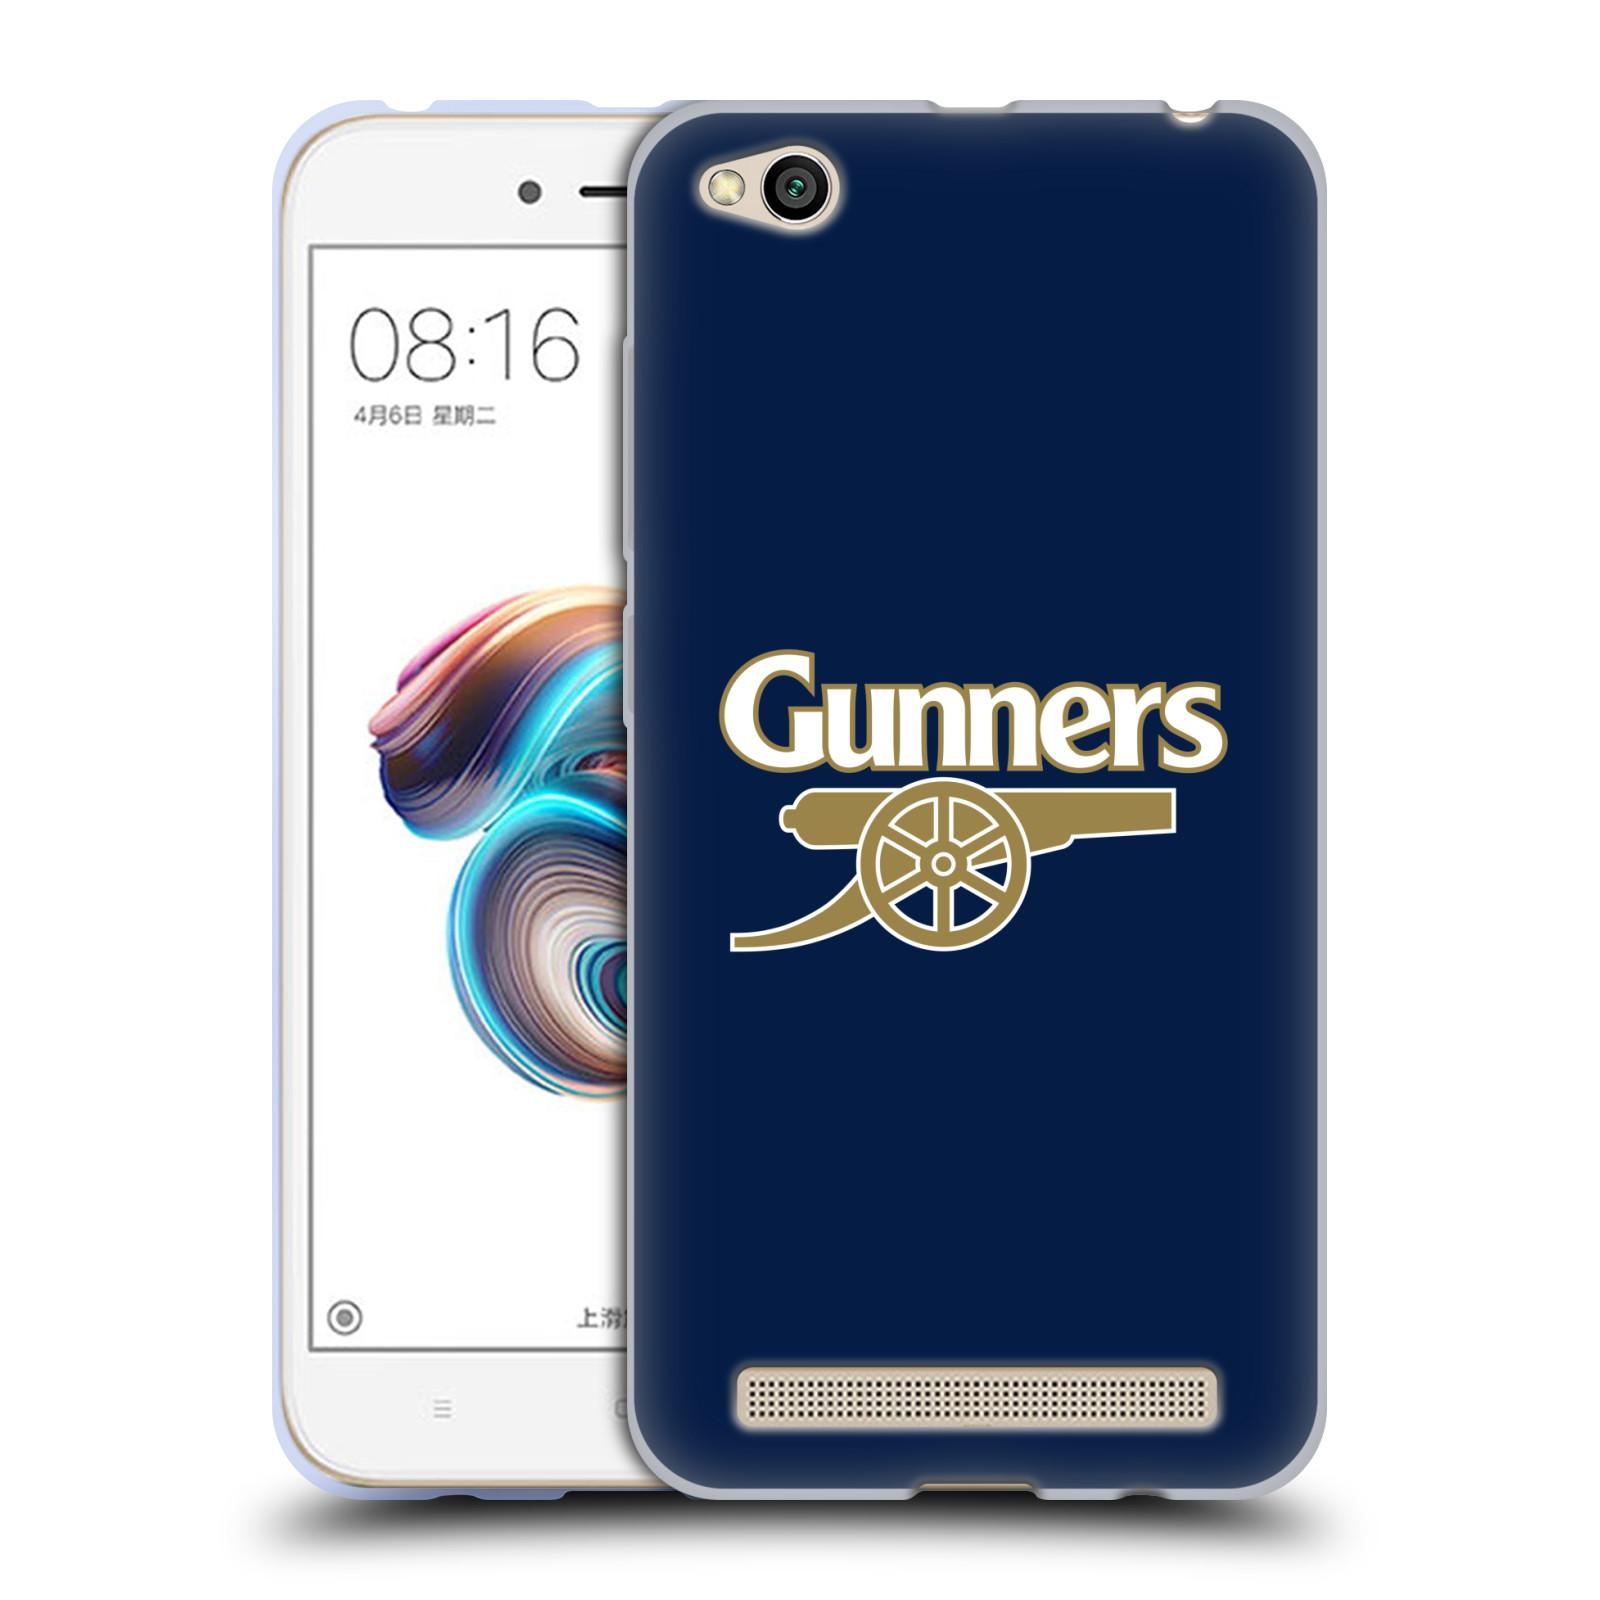 Silikonové pouzdro na mobil Xiaomi Redmi 5A - Head Case - Arsenal FC - Gunners